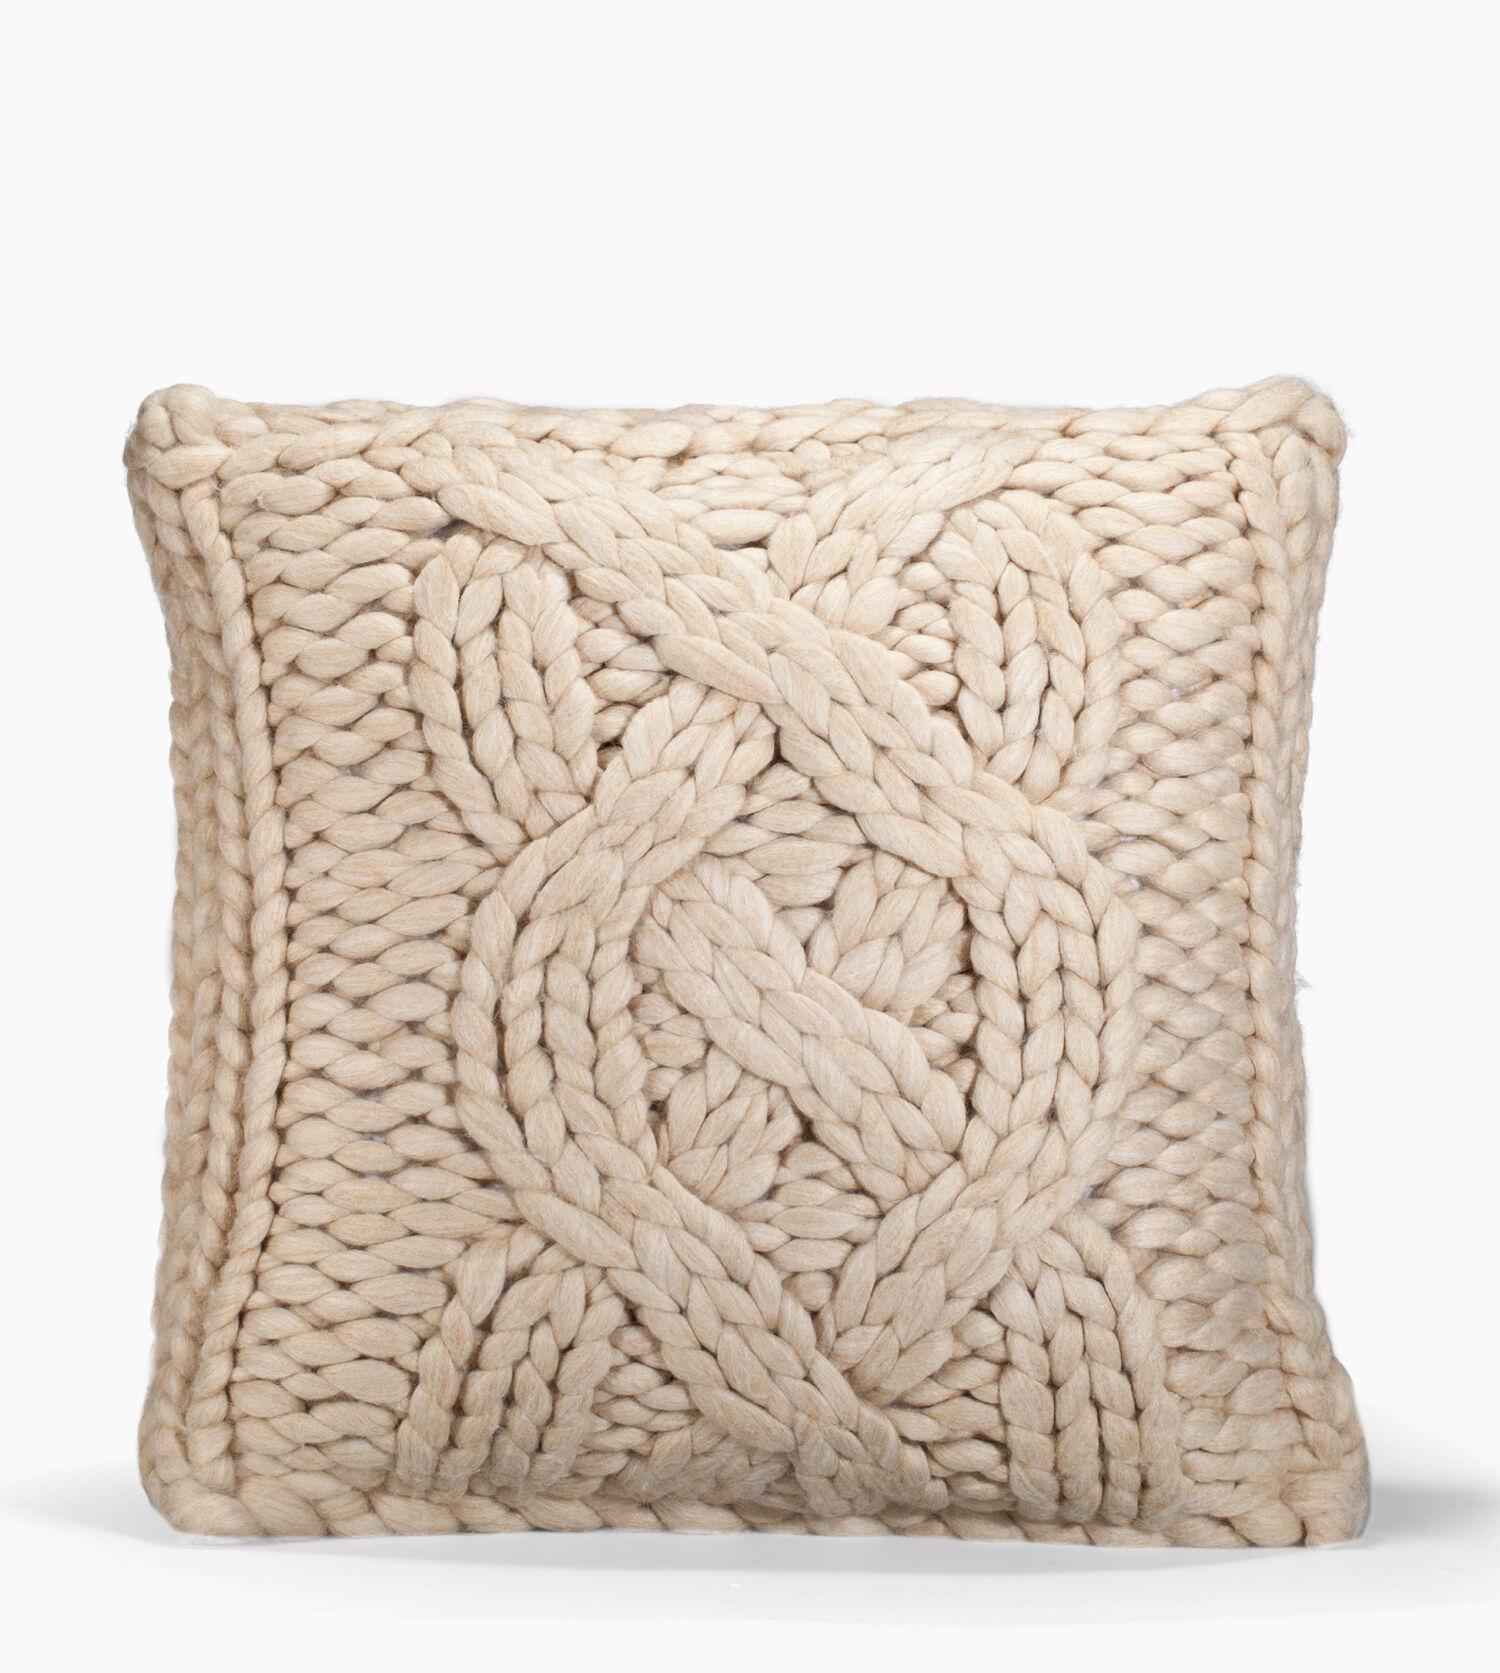 Ugg Official Oversized Knit Pillow 20 Ugg Com